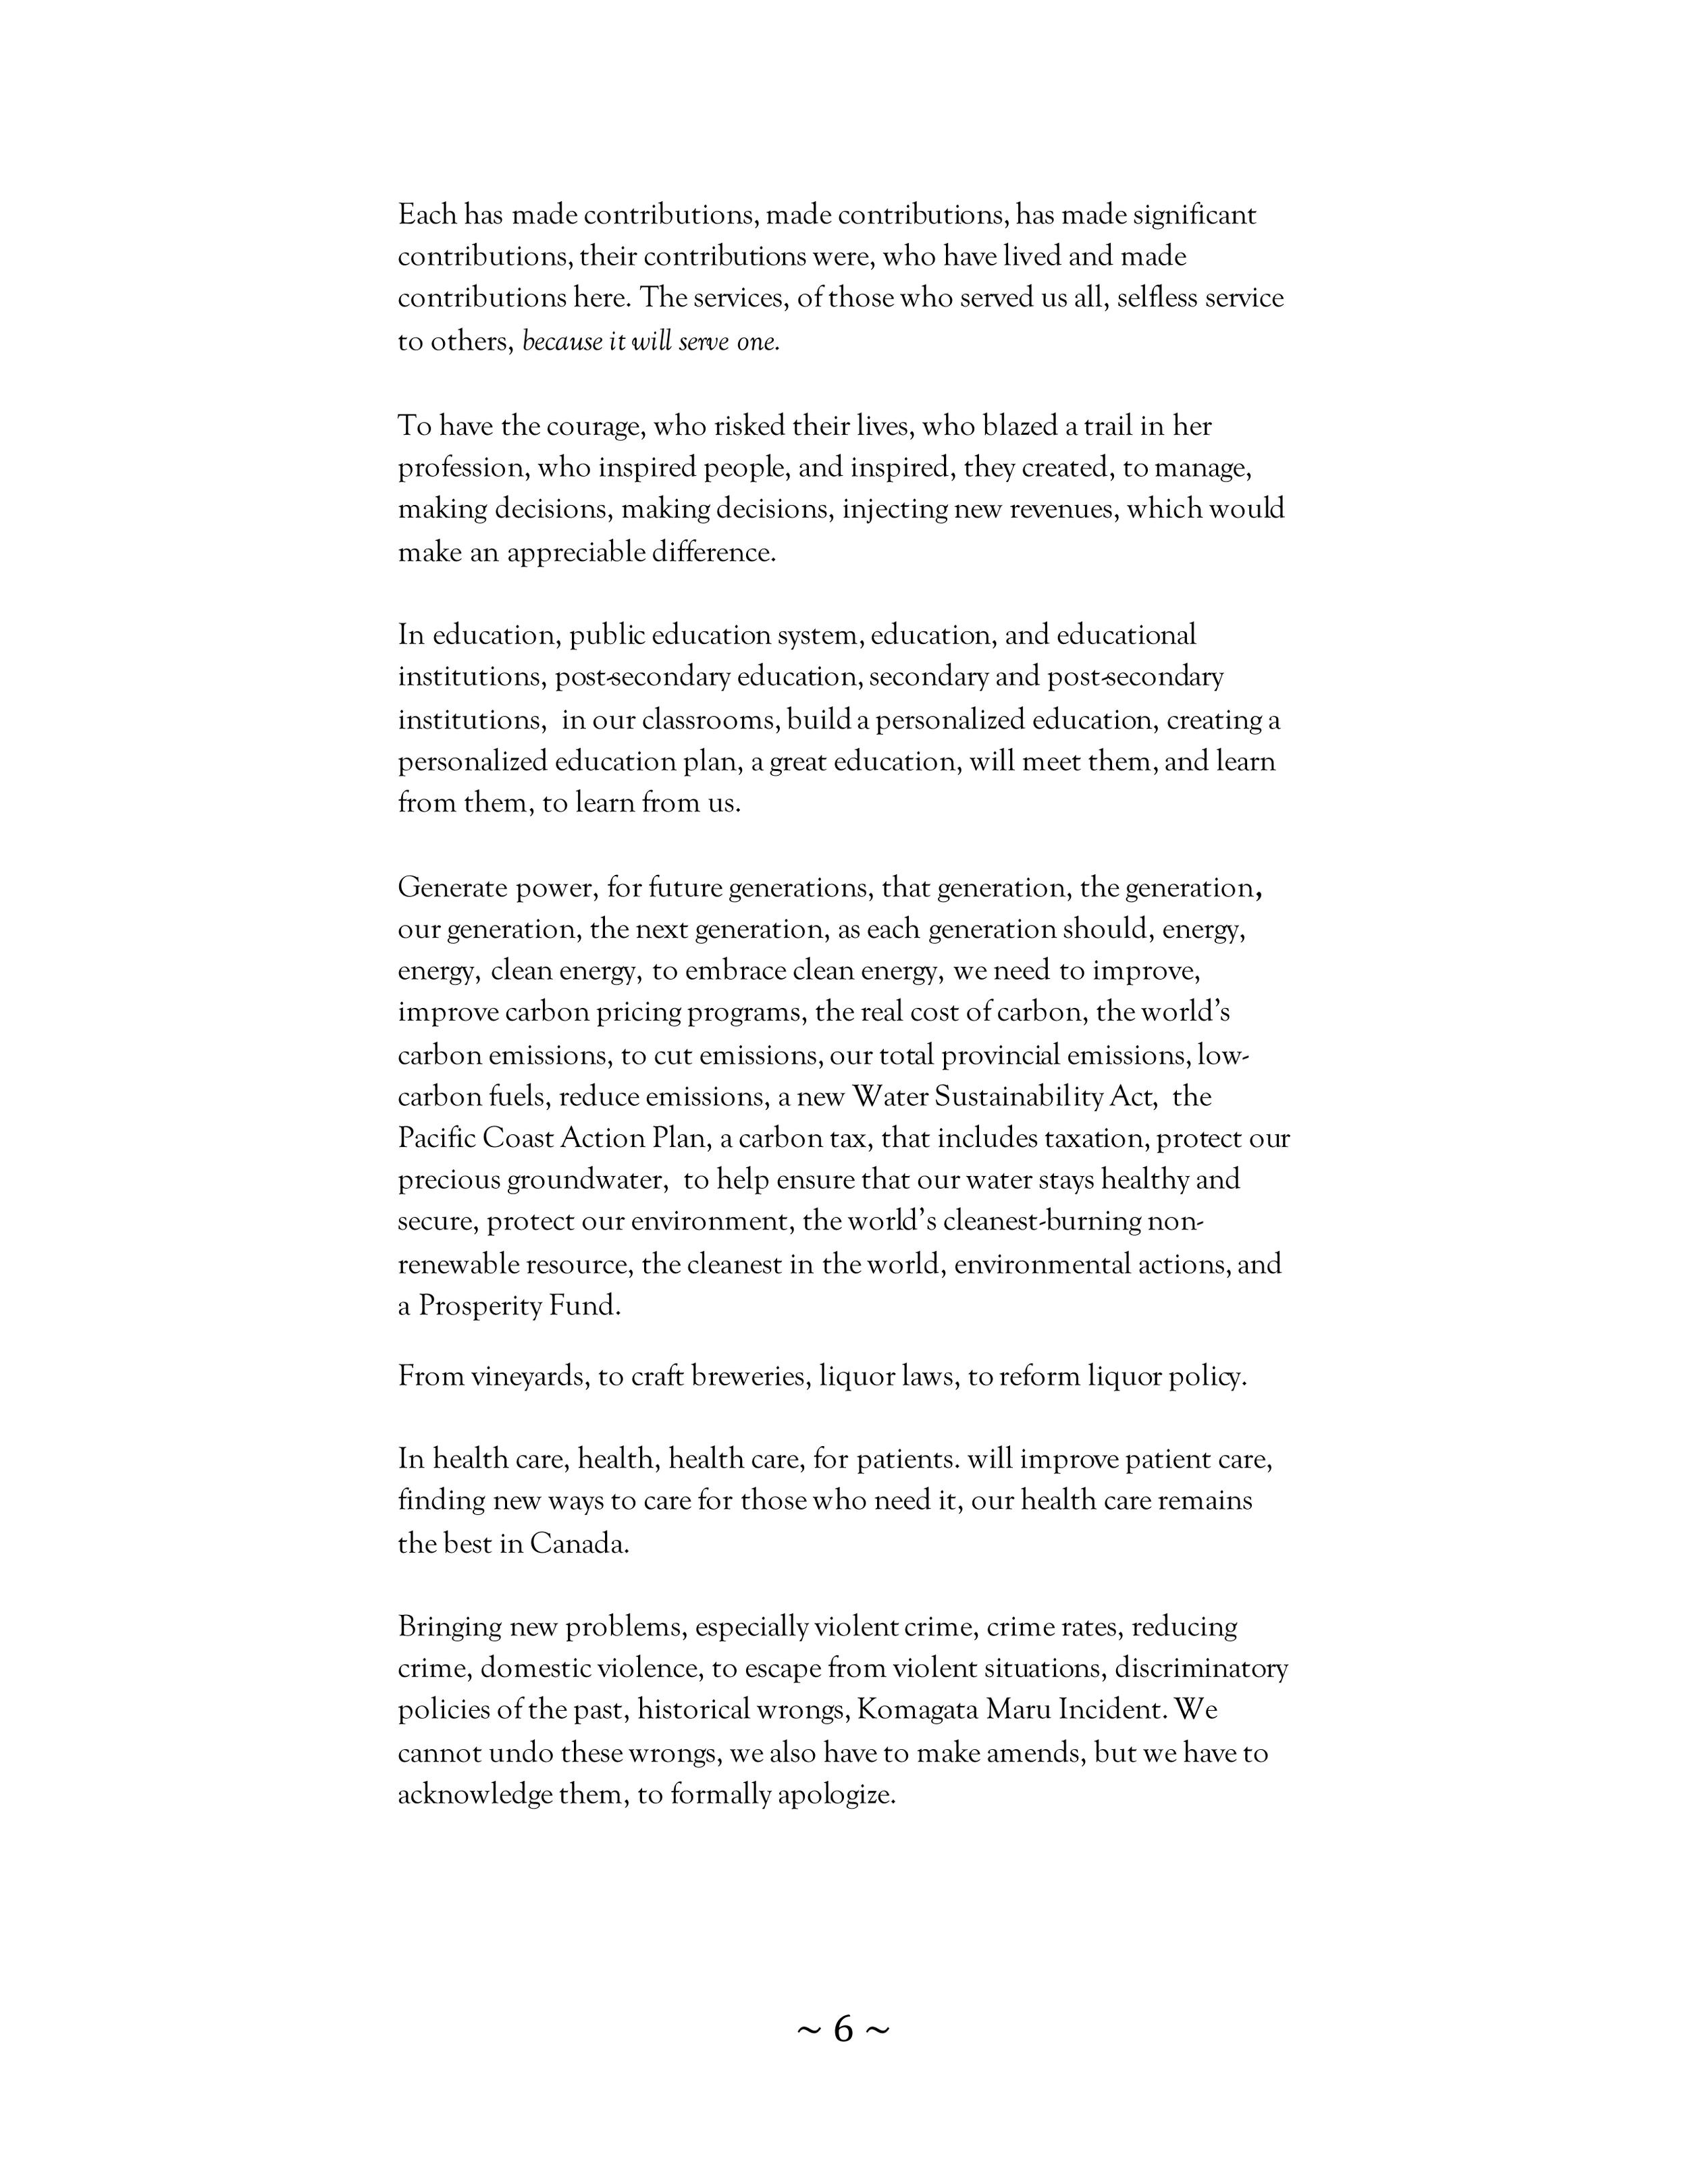 Speech from the Throne 2014-6.jpg